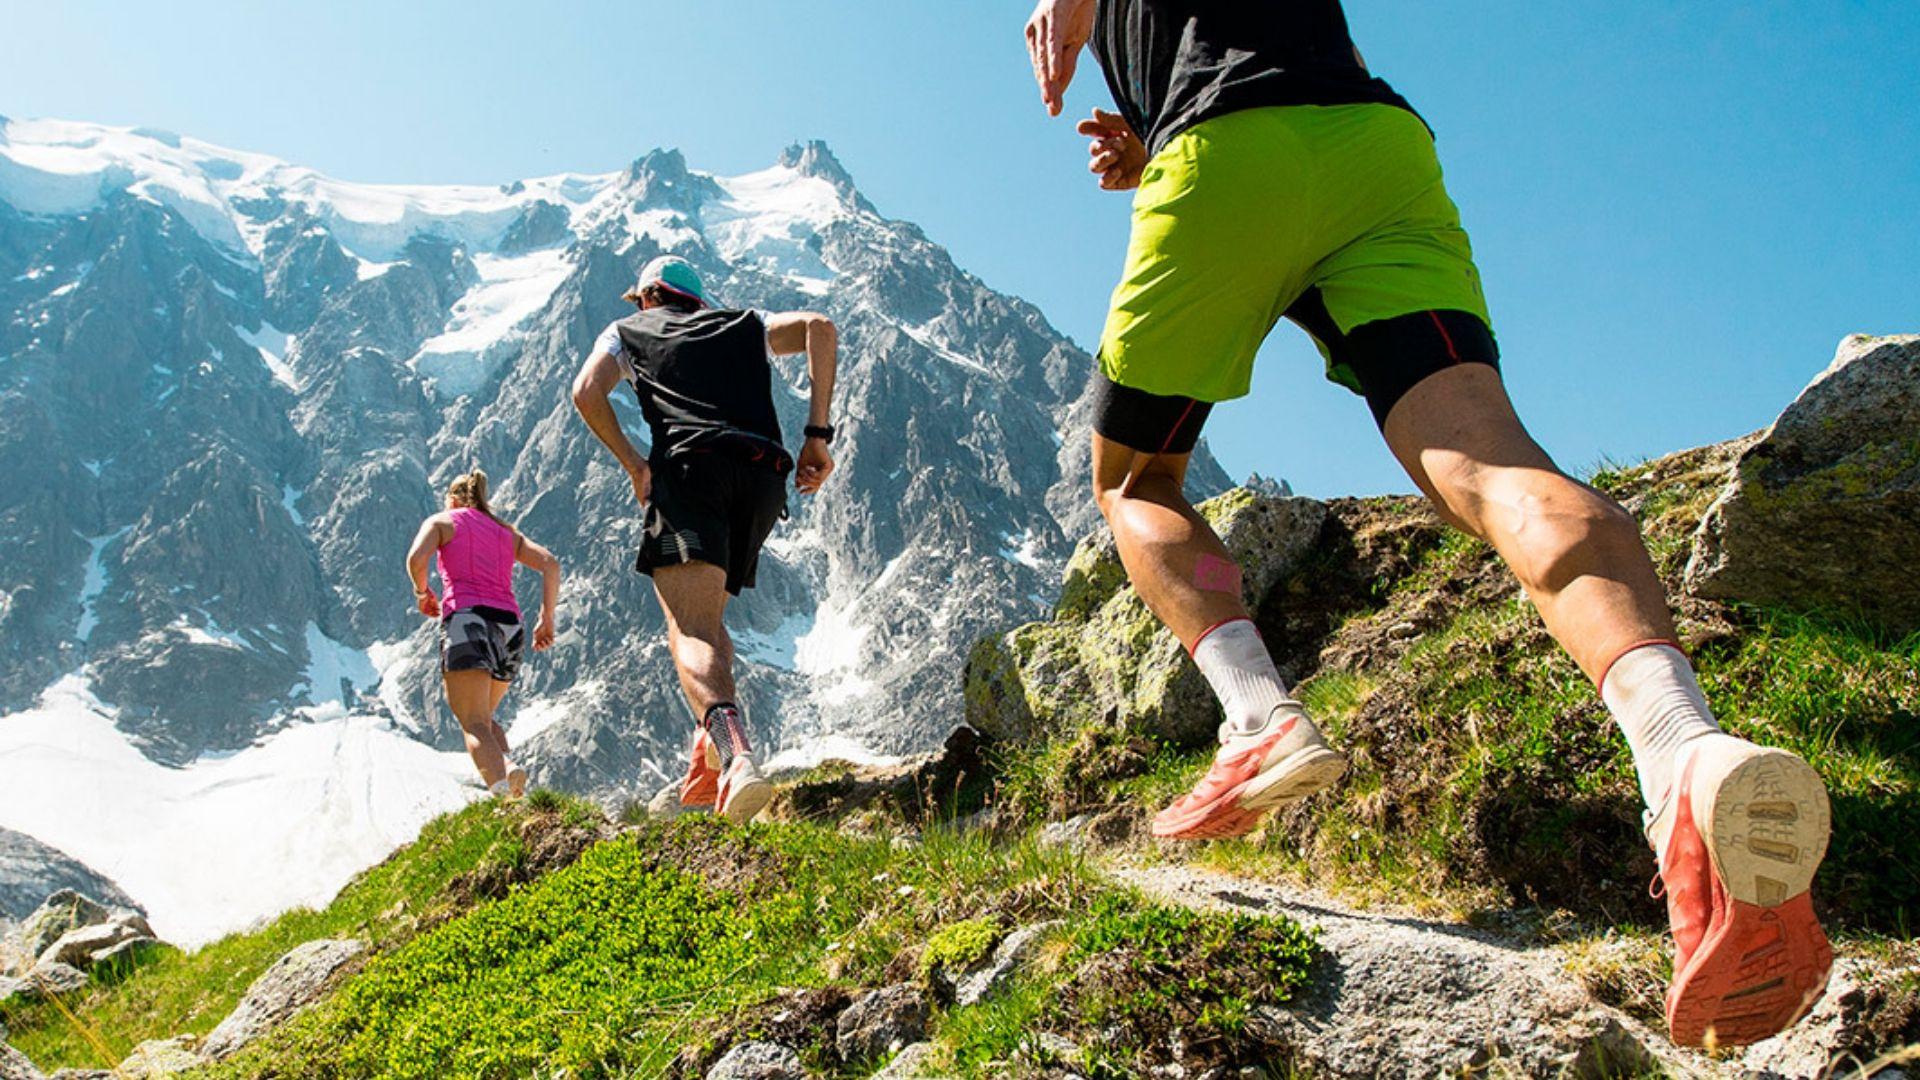 trip to trail run|trail running travel planner app